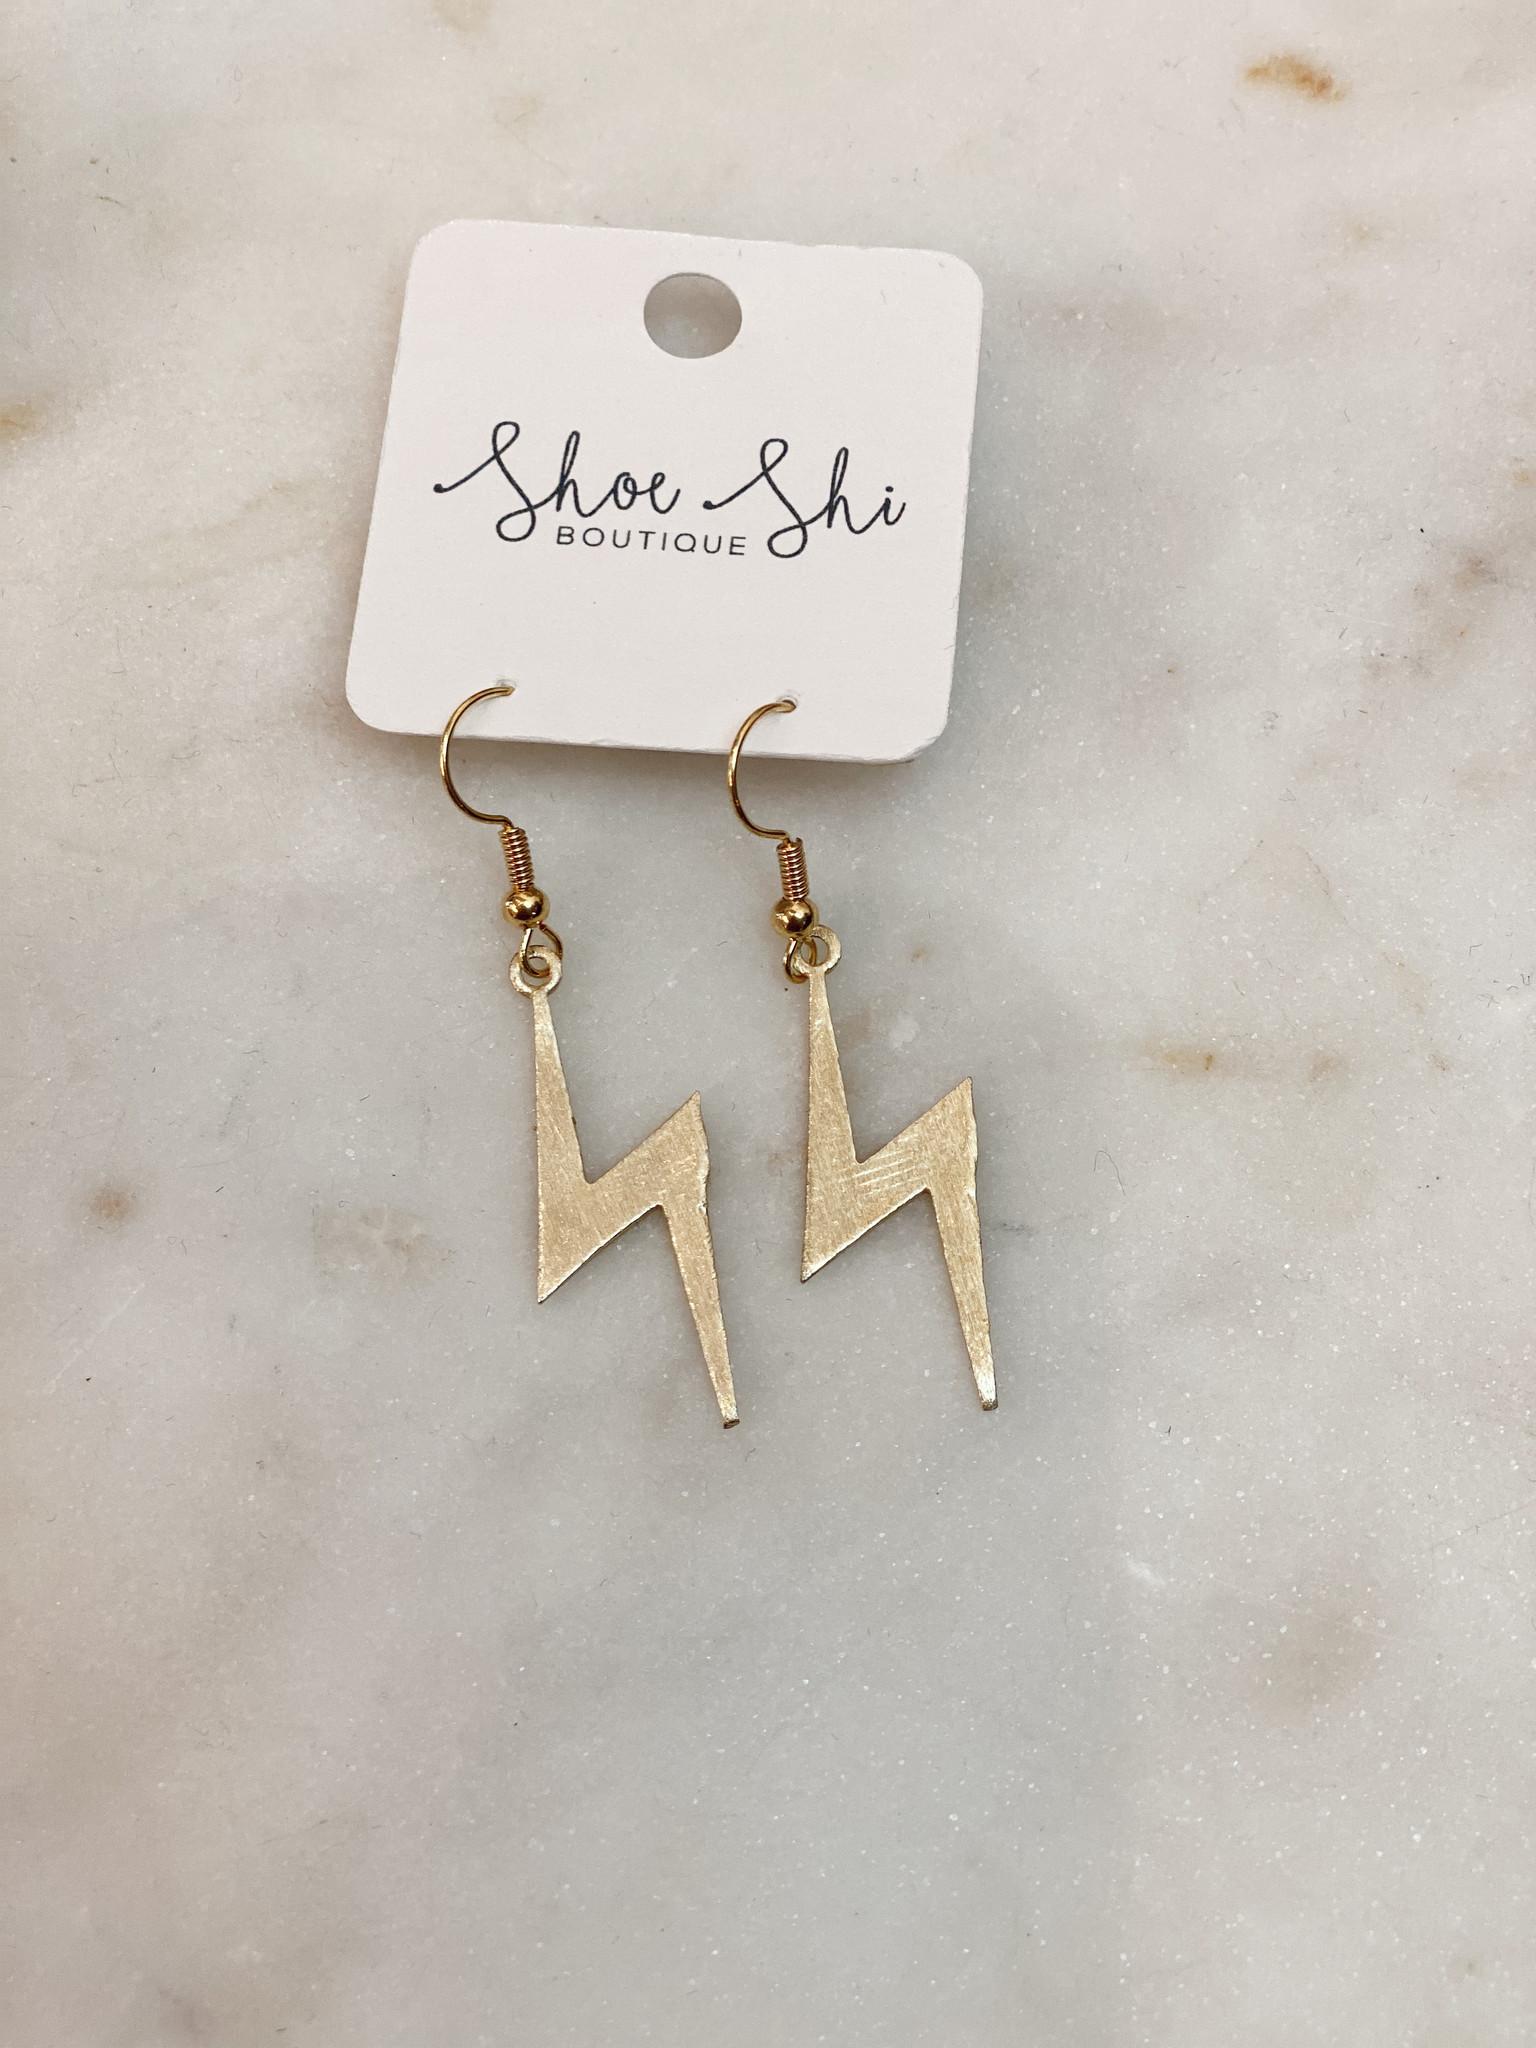 SAJ Flash Out Lightning Earrings